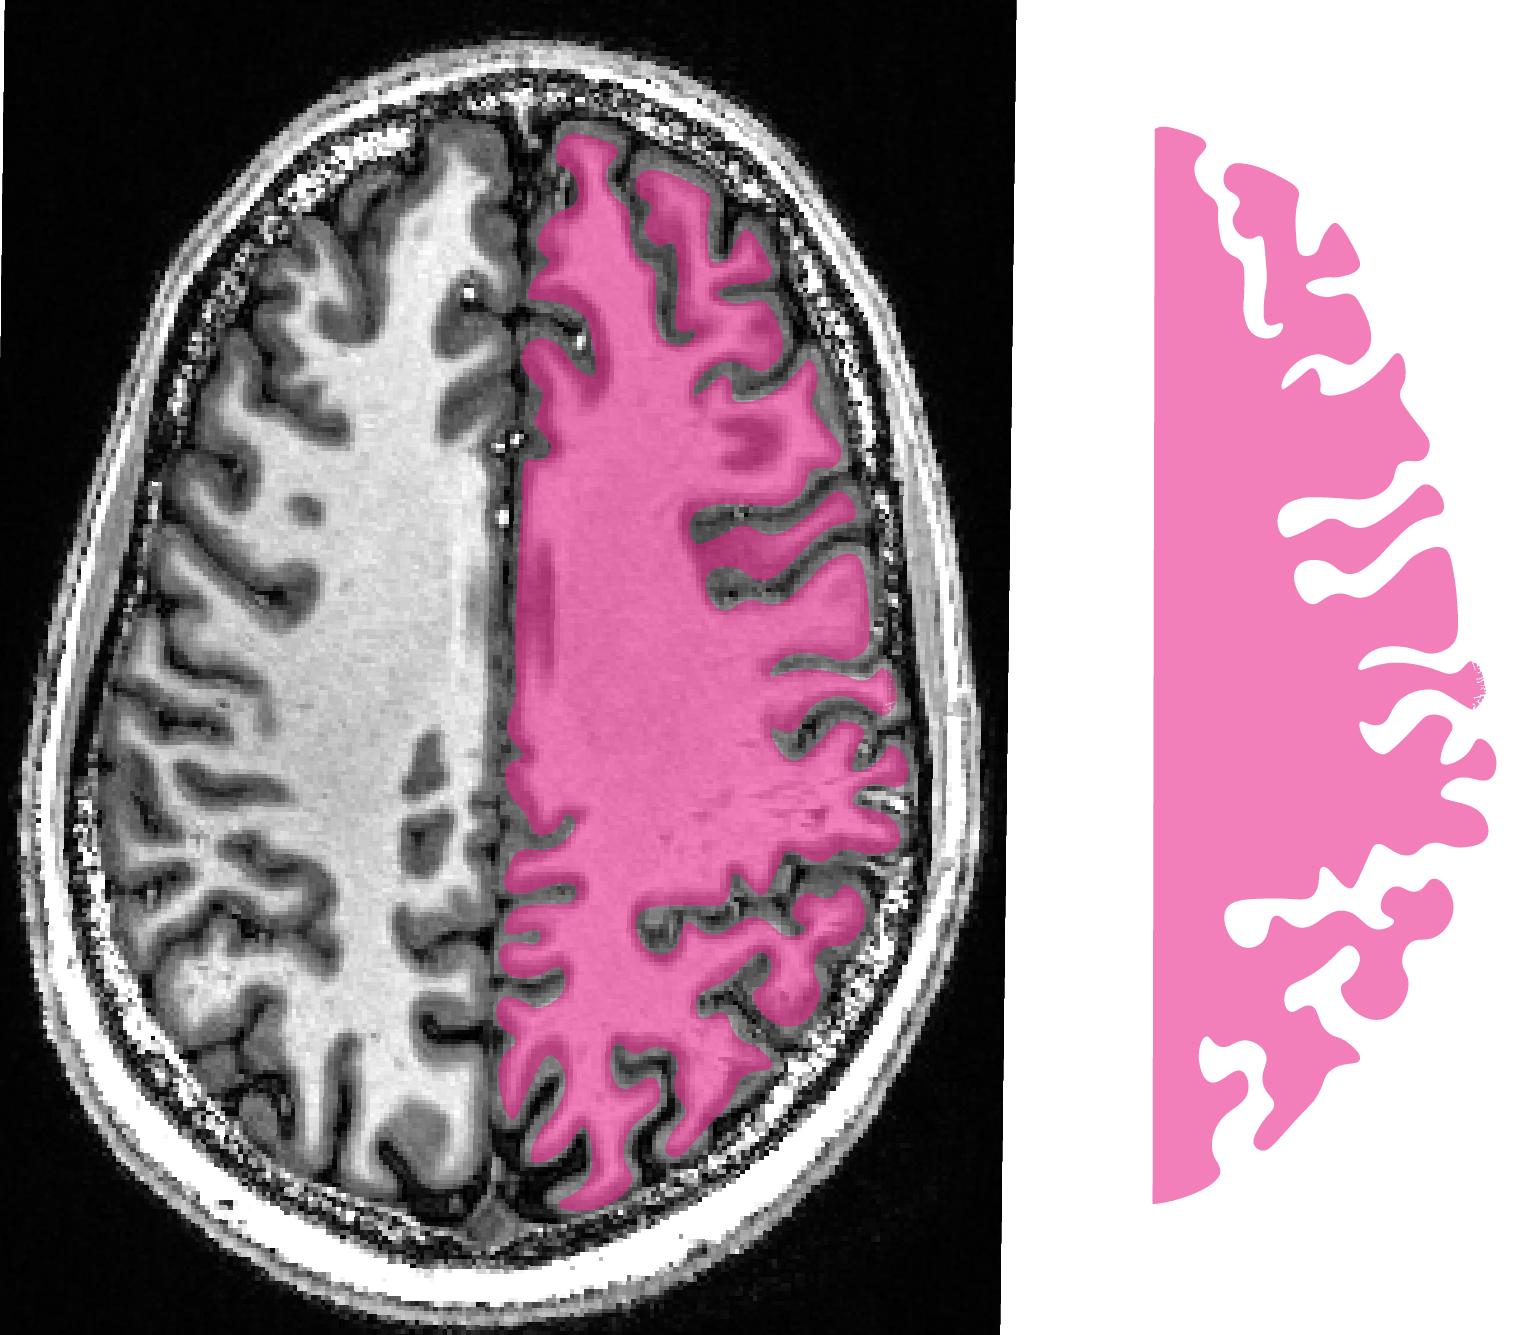 Scale_less_brain-01